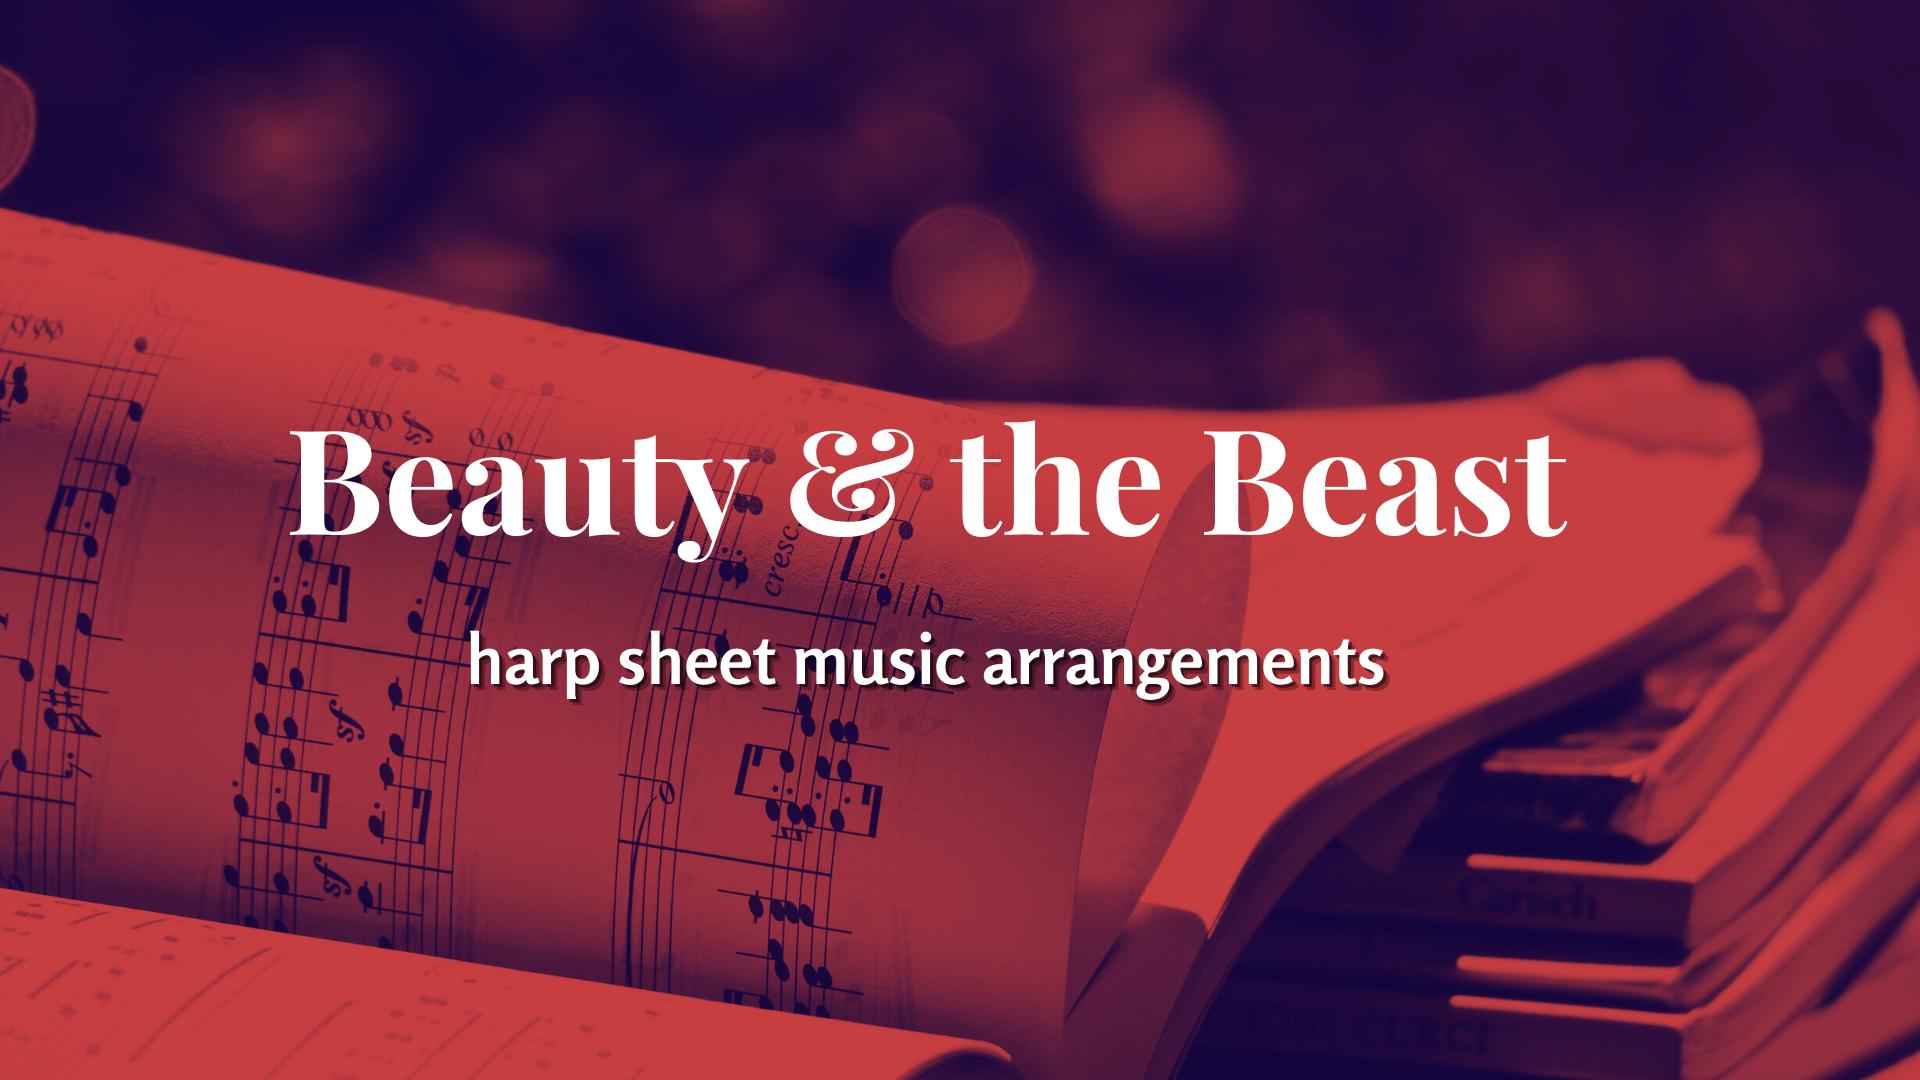 Beauty and the Beast - harp sheet music arrangements - magicharp.com